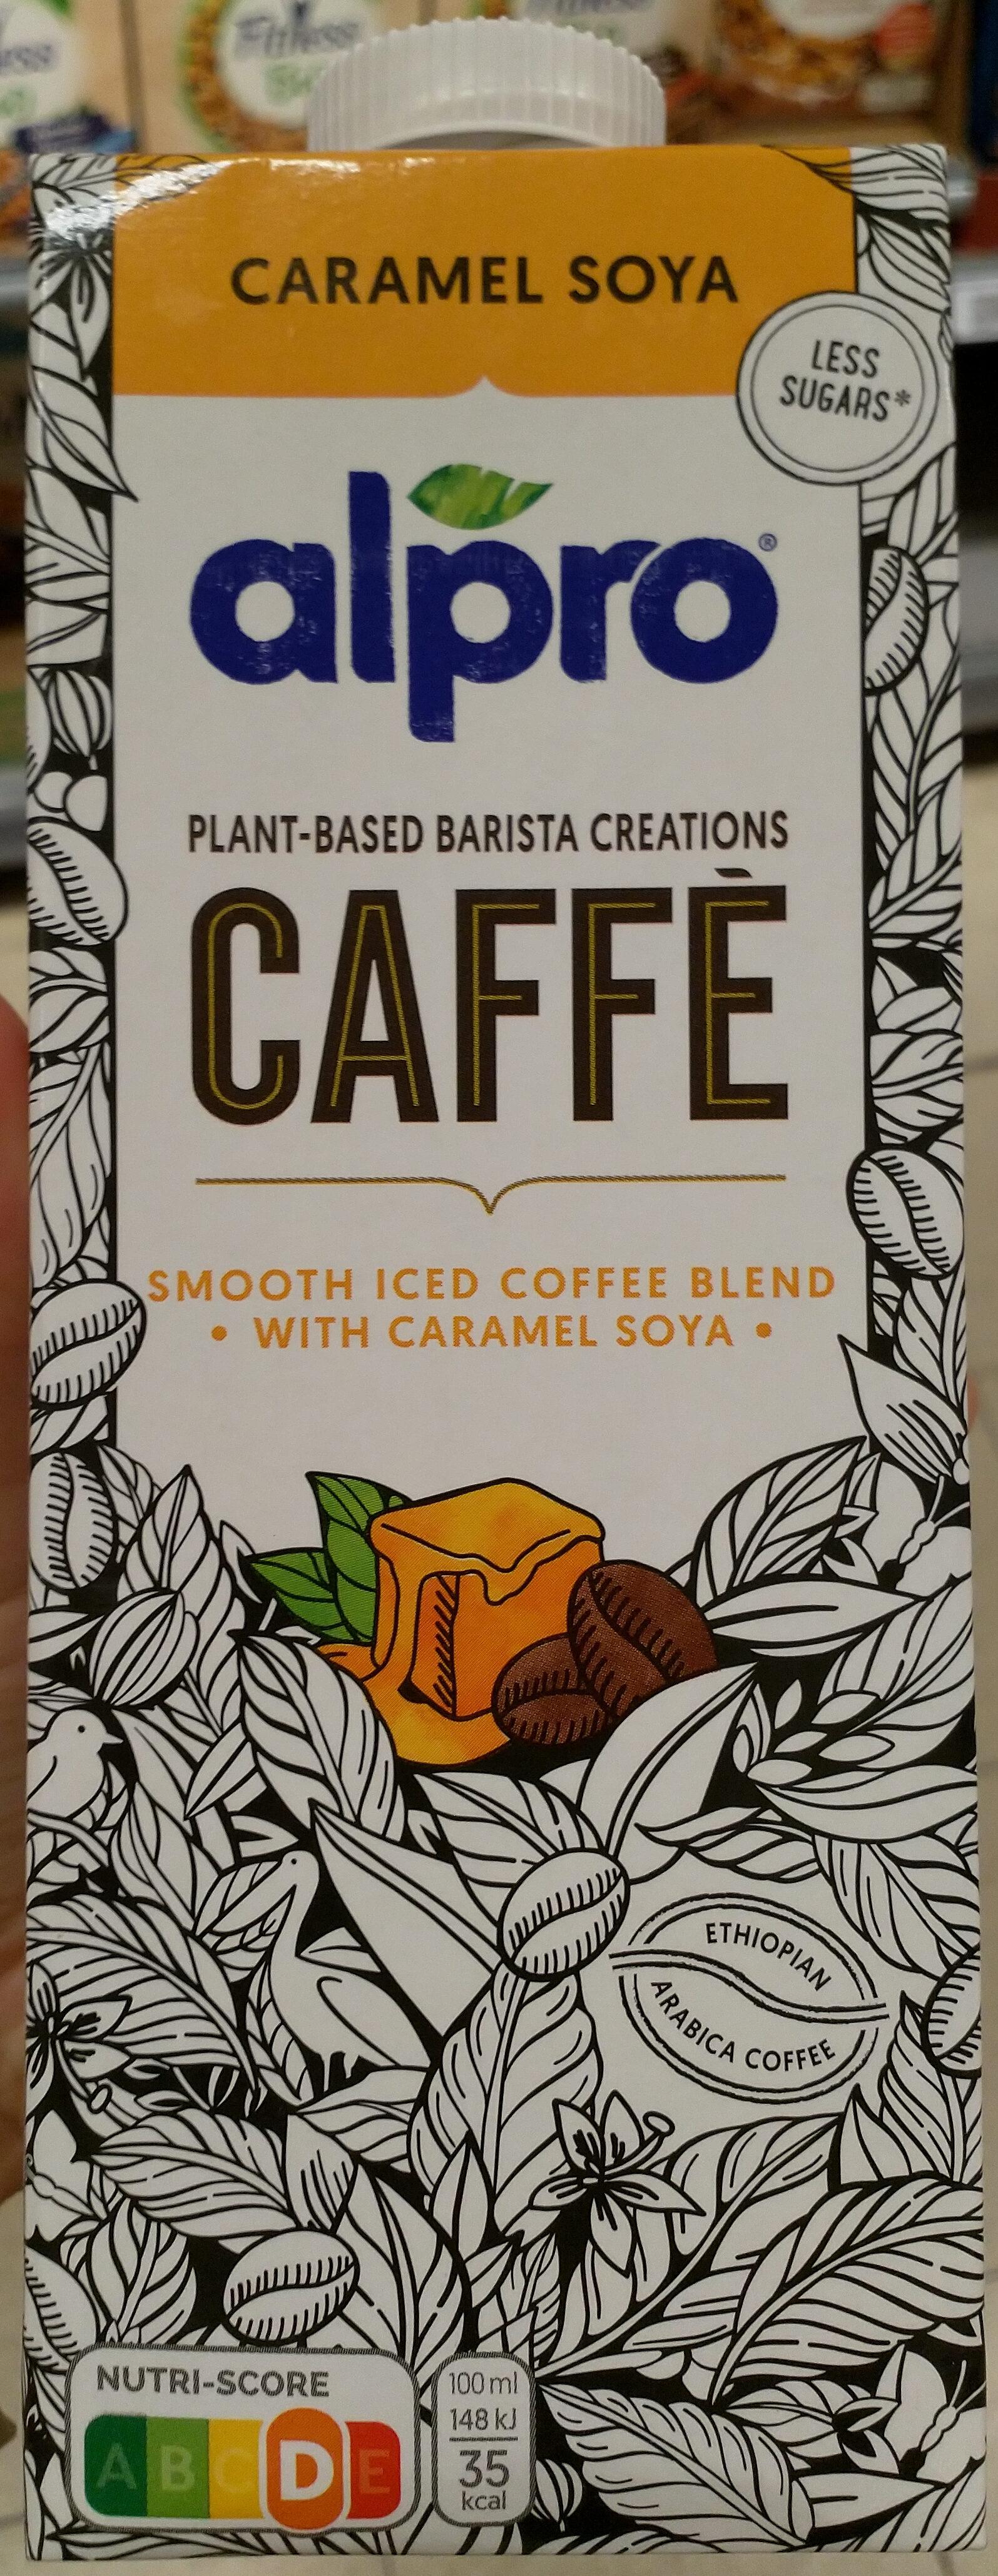 Caffè soja carramel - Product - de